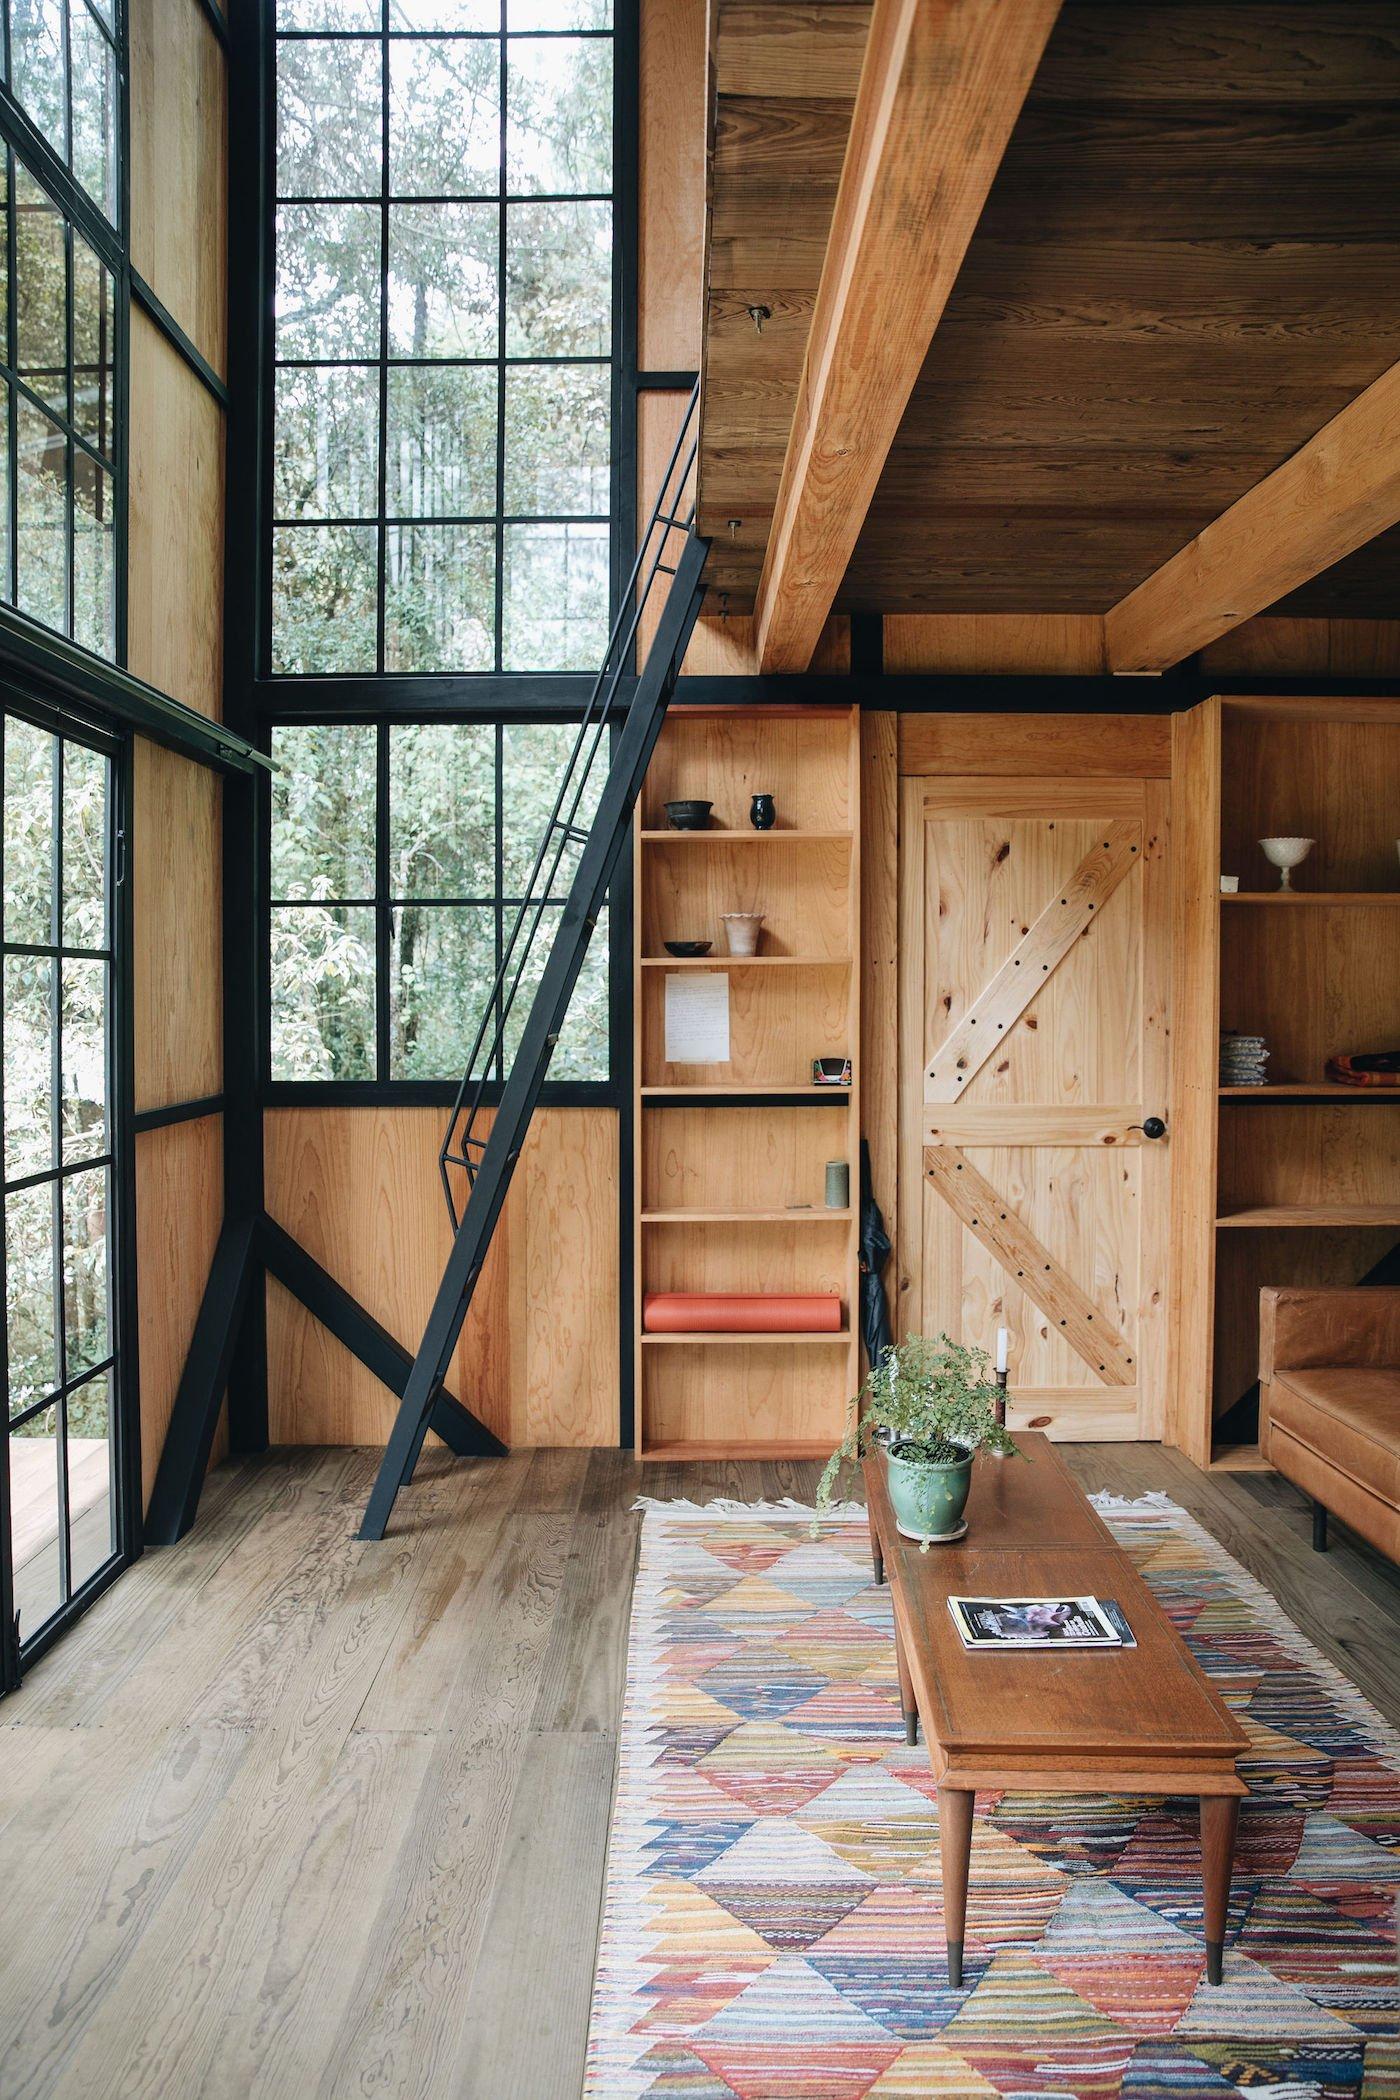 Large windows and timber walls timber flooring